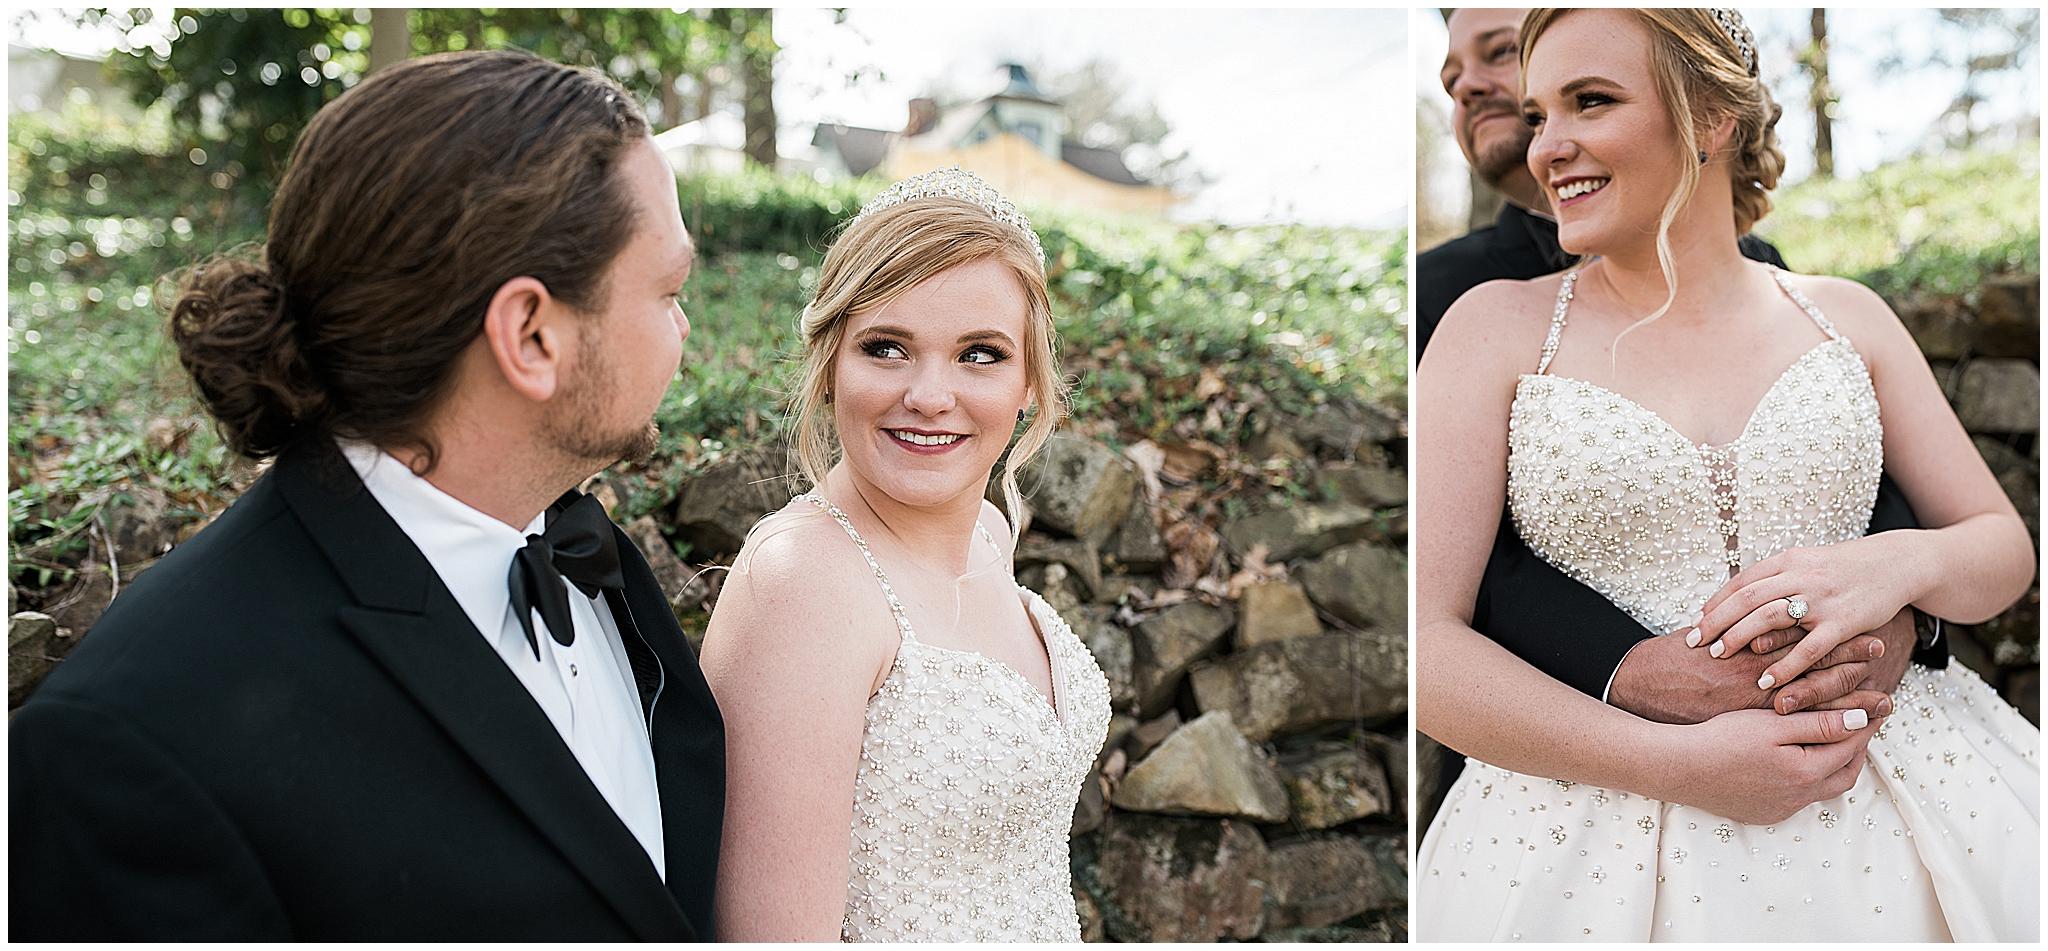 Wedding_Photographers_Asheville_Mountain_Magnolia_Inn_0019.jpg